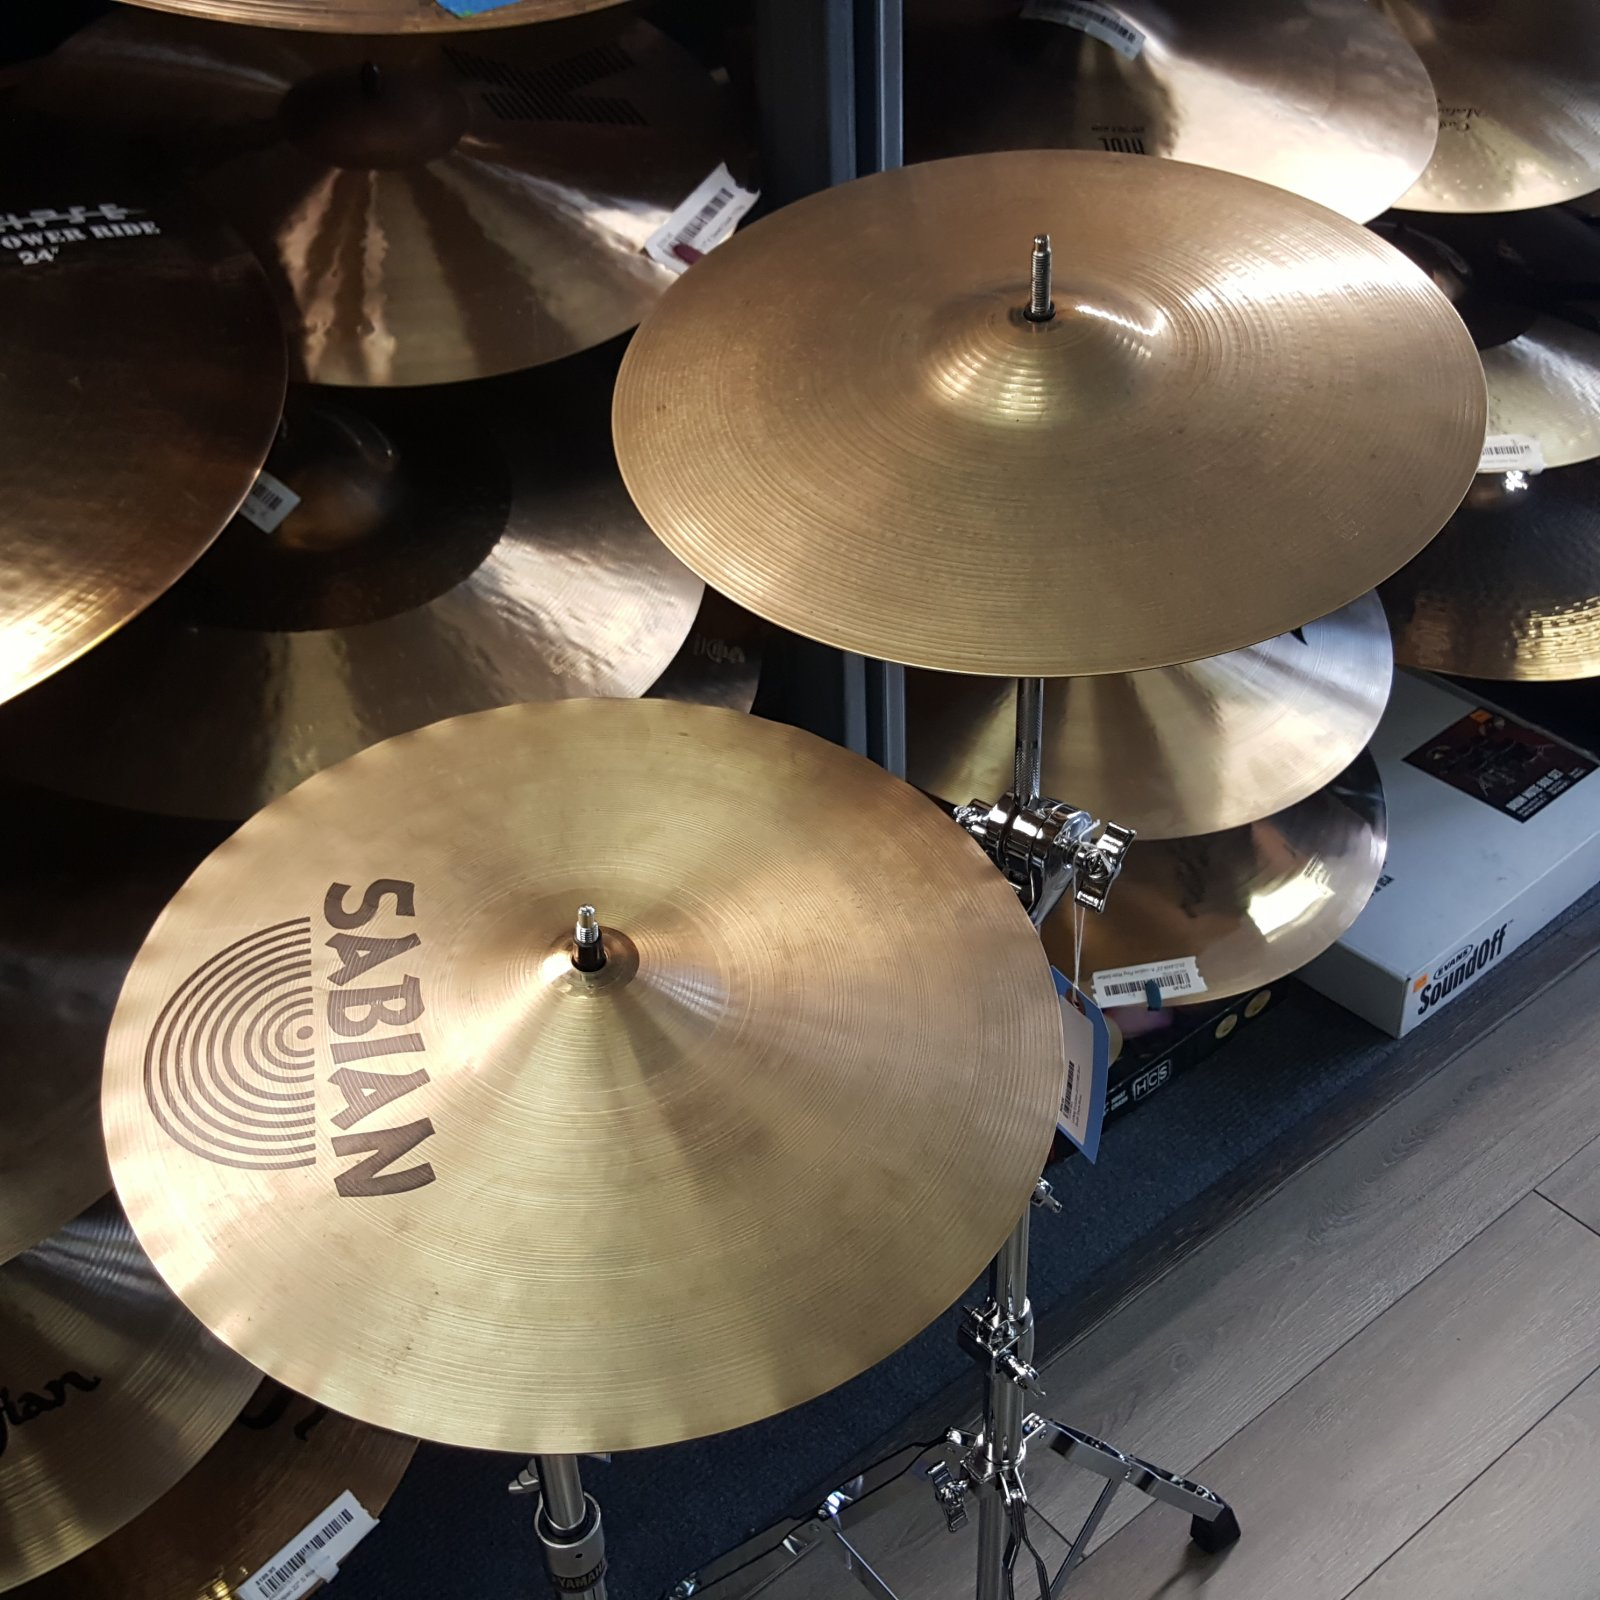 USED Sabian AAX X-Celerator Hihat Cymbals Mixed Set 1180g 1383g